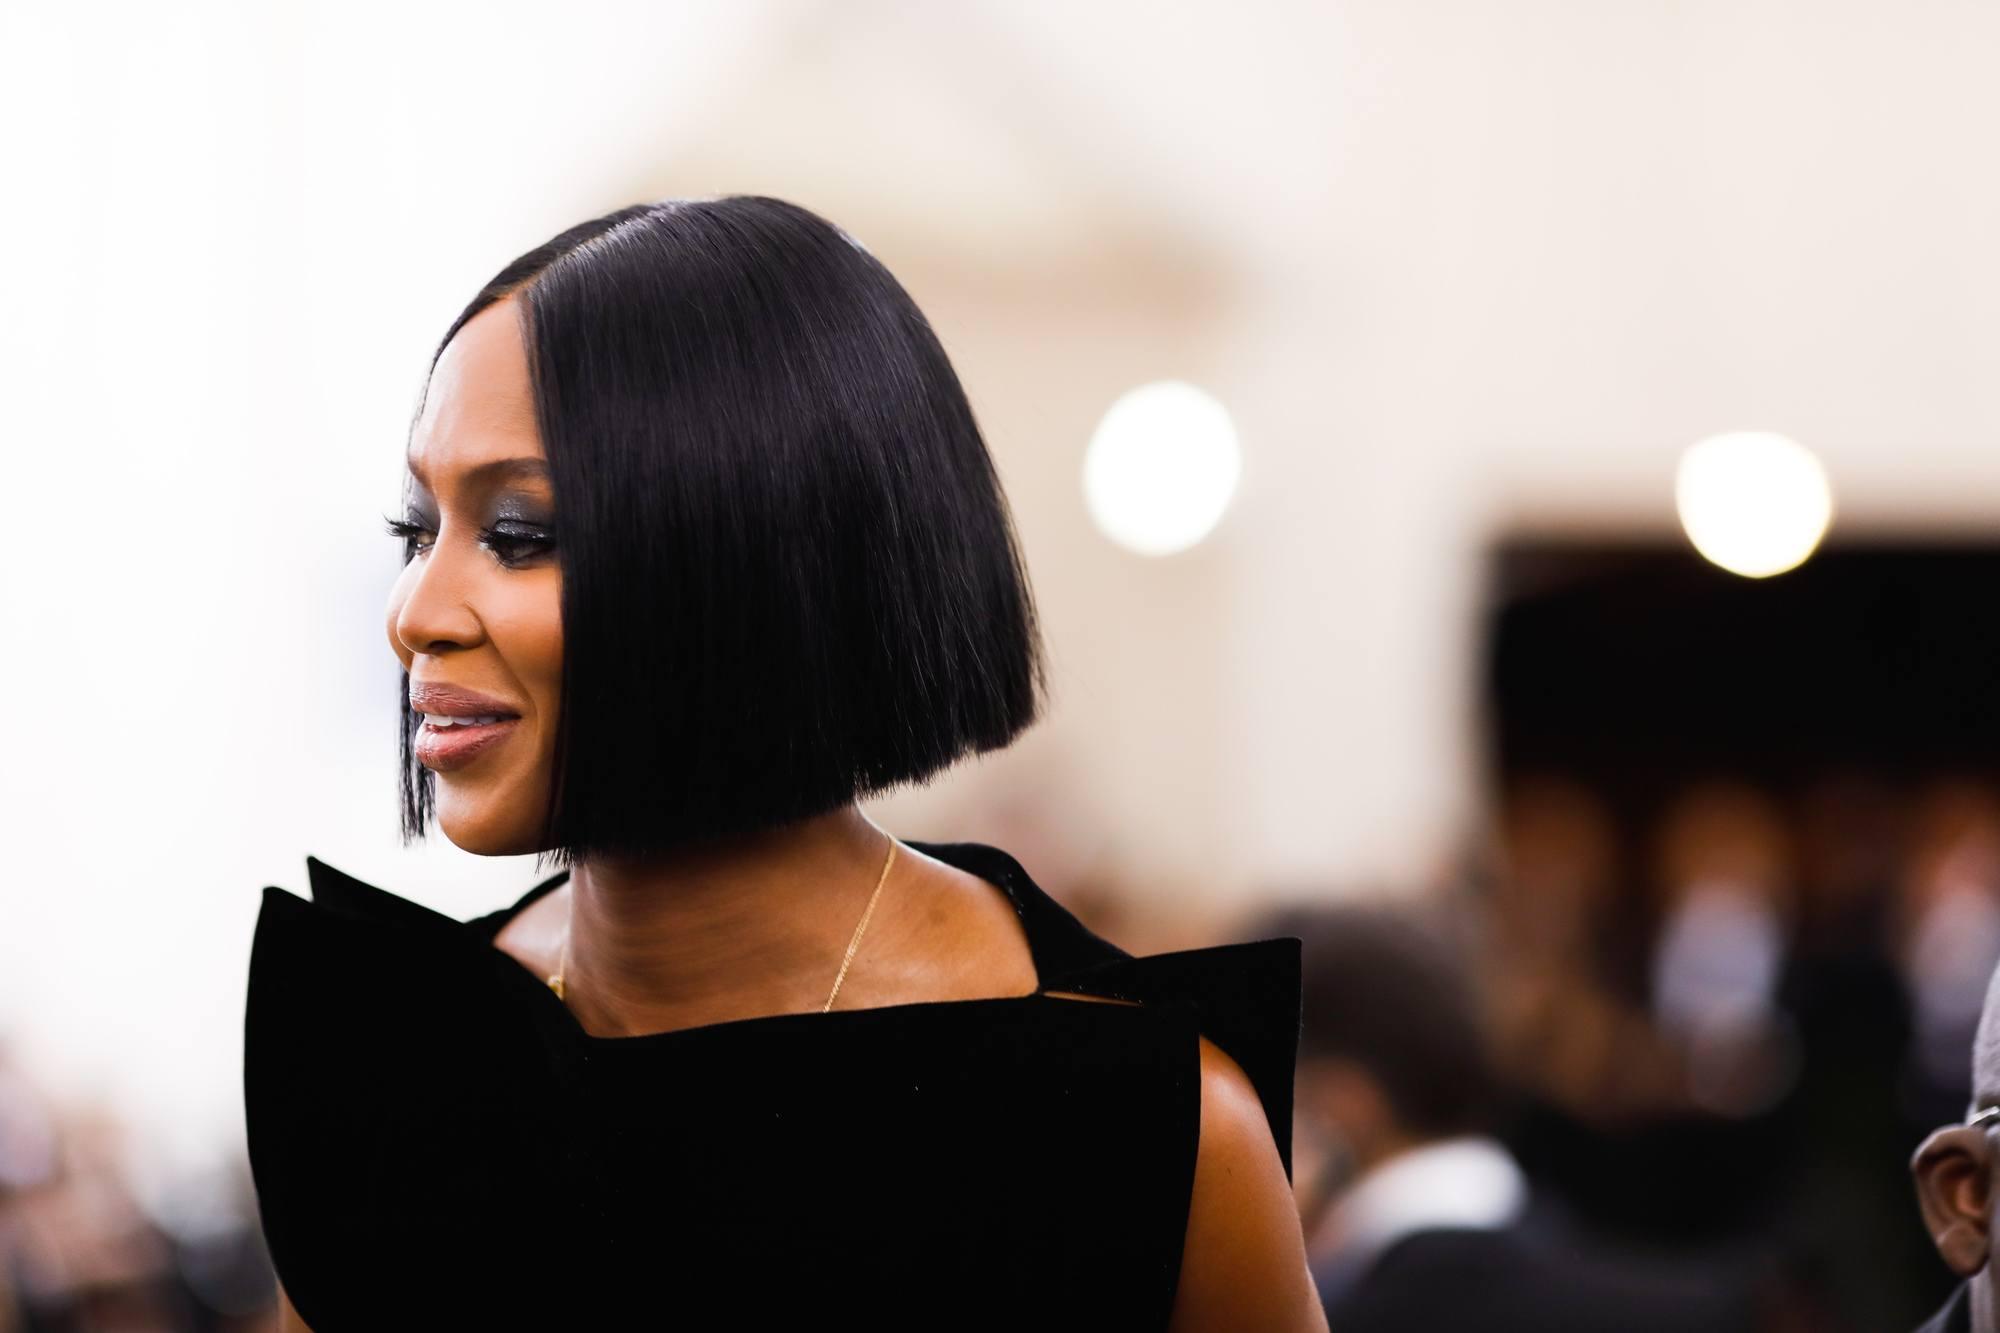 Naomi Campbell's blunt bob at the Met gala 2017